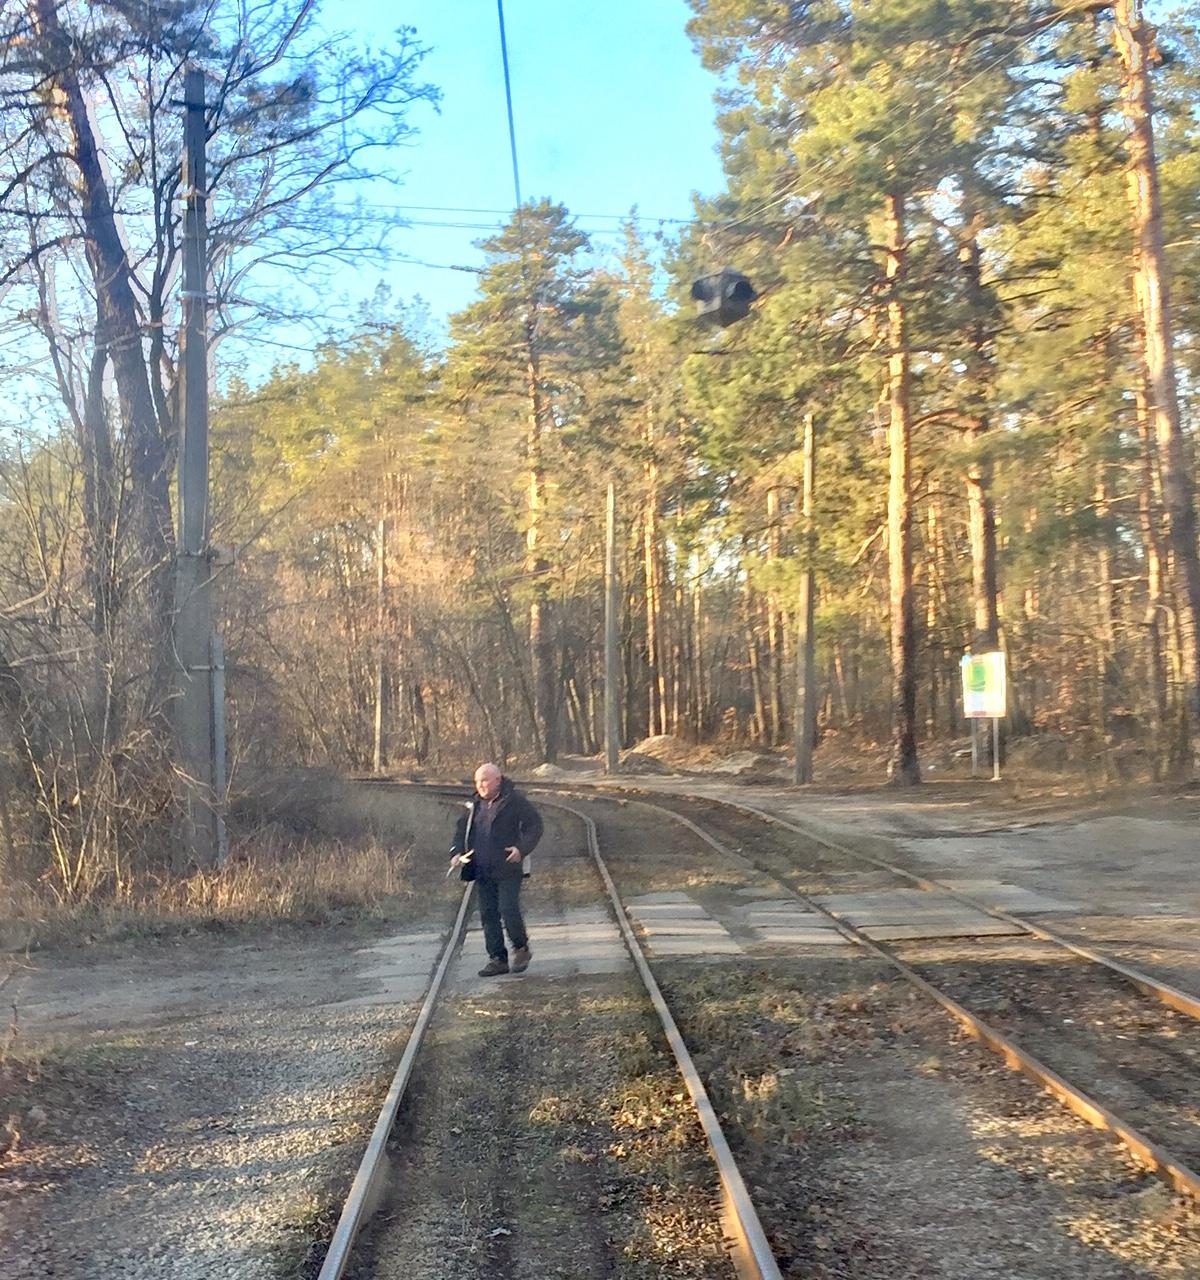 Kyiv tram through the forest